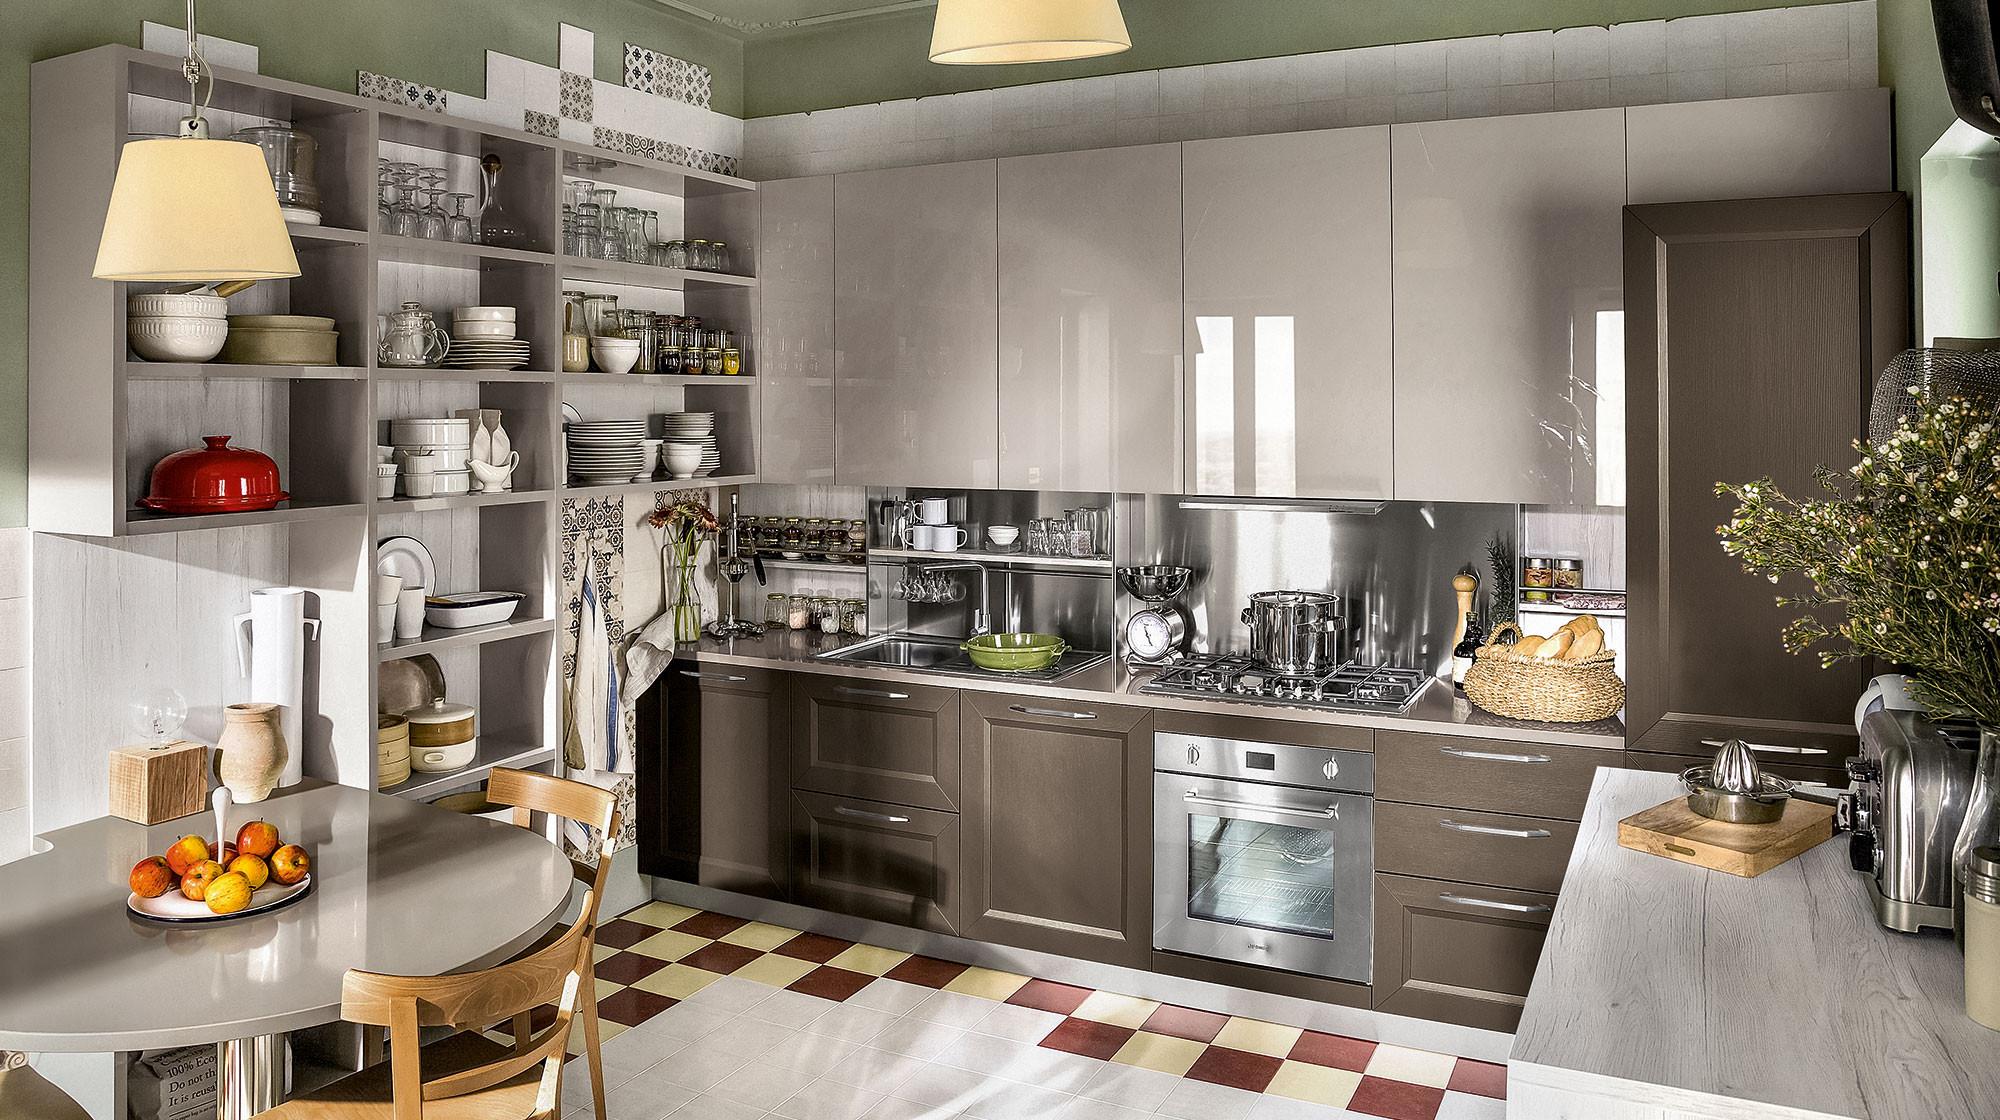 Veneta Cucine Maniglie.Cucina Tablet Veneta Cucine